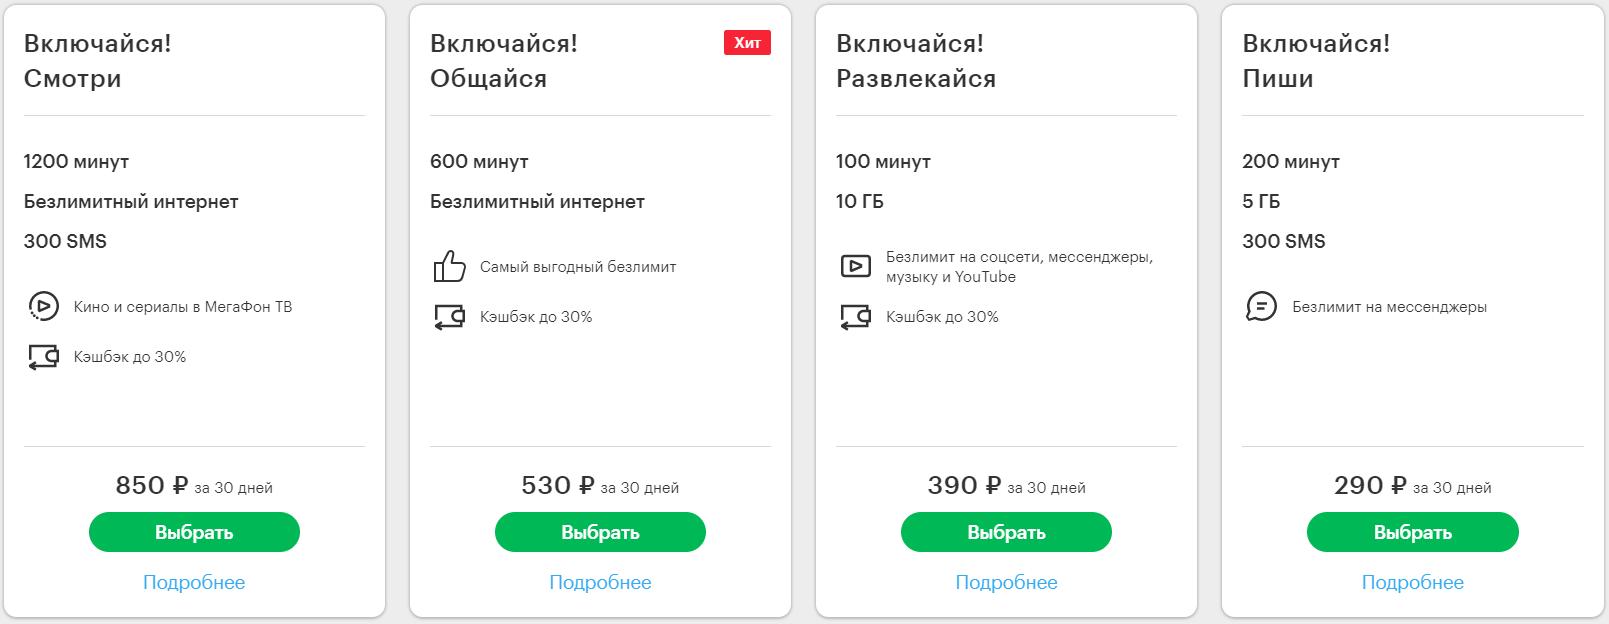 Тарифы Мегафон во Владикавказе для смартфонов